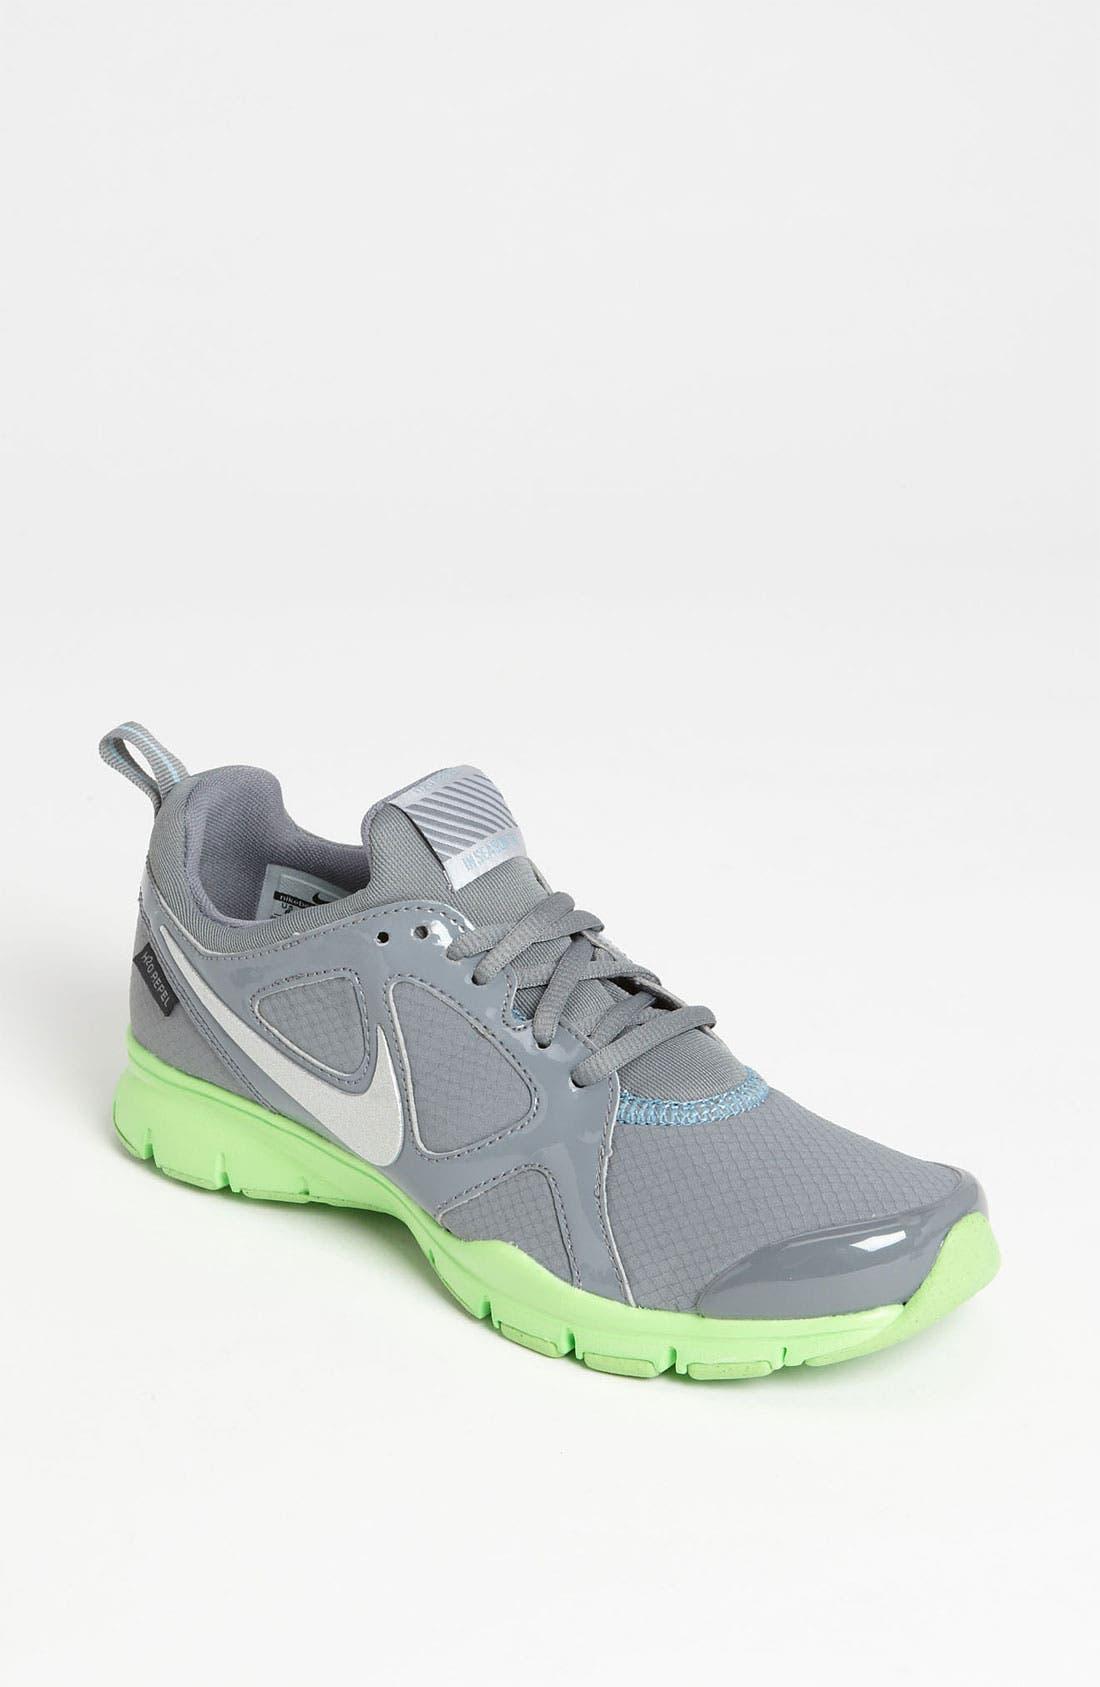 Alternate Image 1 Selected - Nike 'In Season TR 2 Shield' Training Shoe (Women)